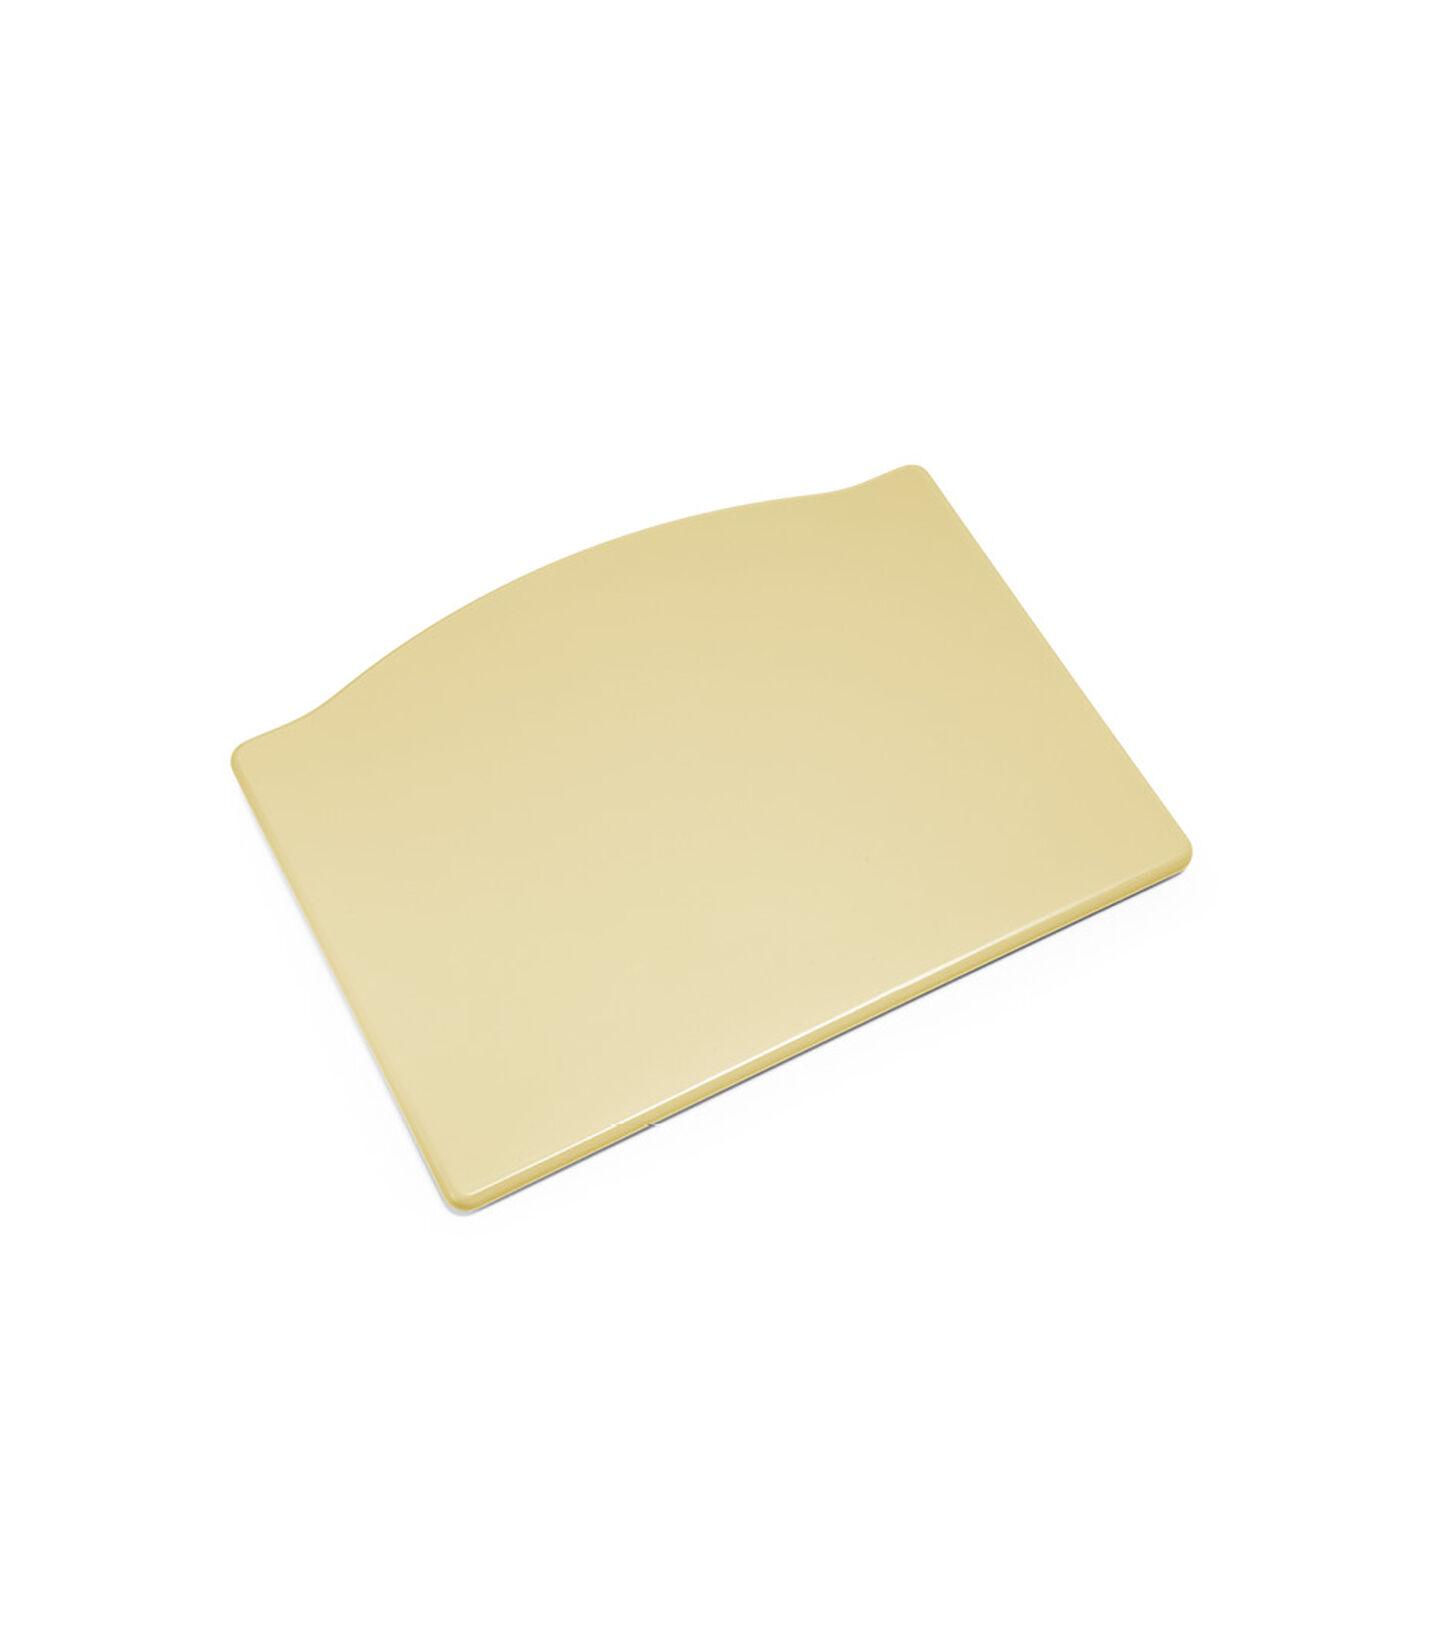 Tripp Trapp® Footplate Wheat Yellow, Wheat Yellow, mainview